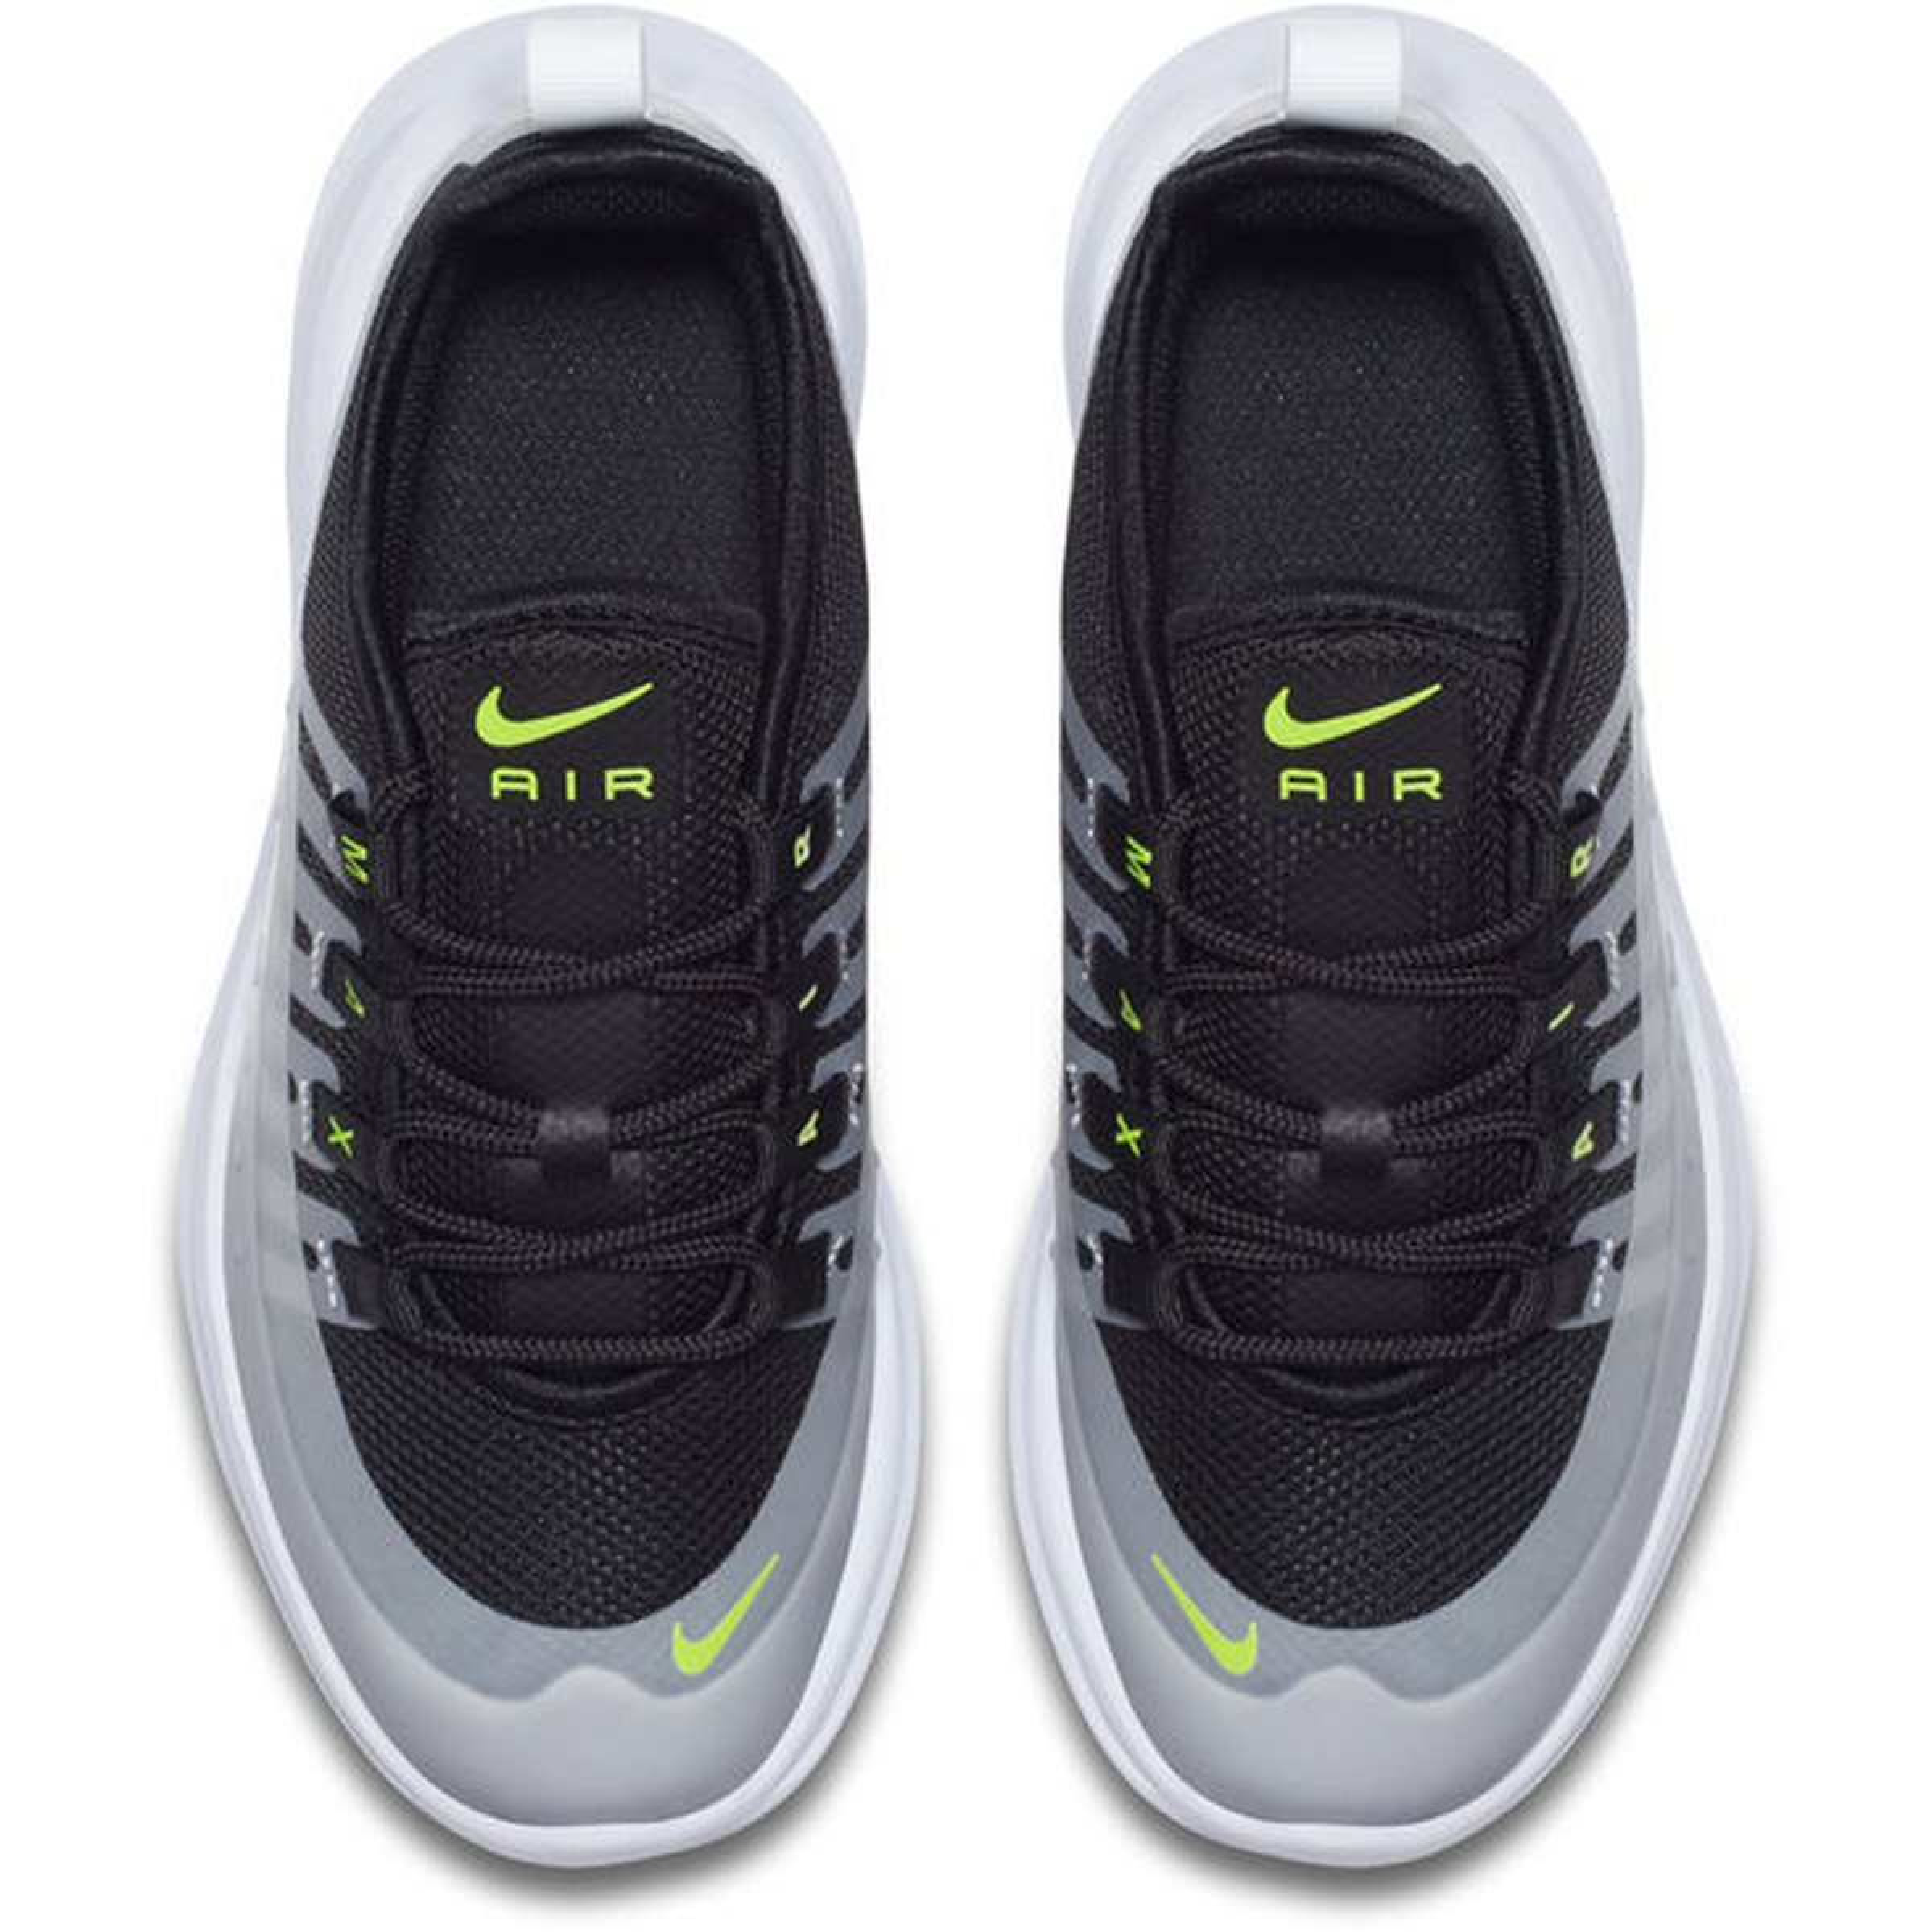 234b81a45f2 Nike Air Max Axis (ps) Junior. AH5223 005. Product afbeelding · Product  afbeelding · Product afbeelding